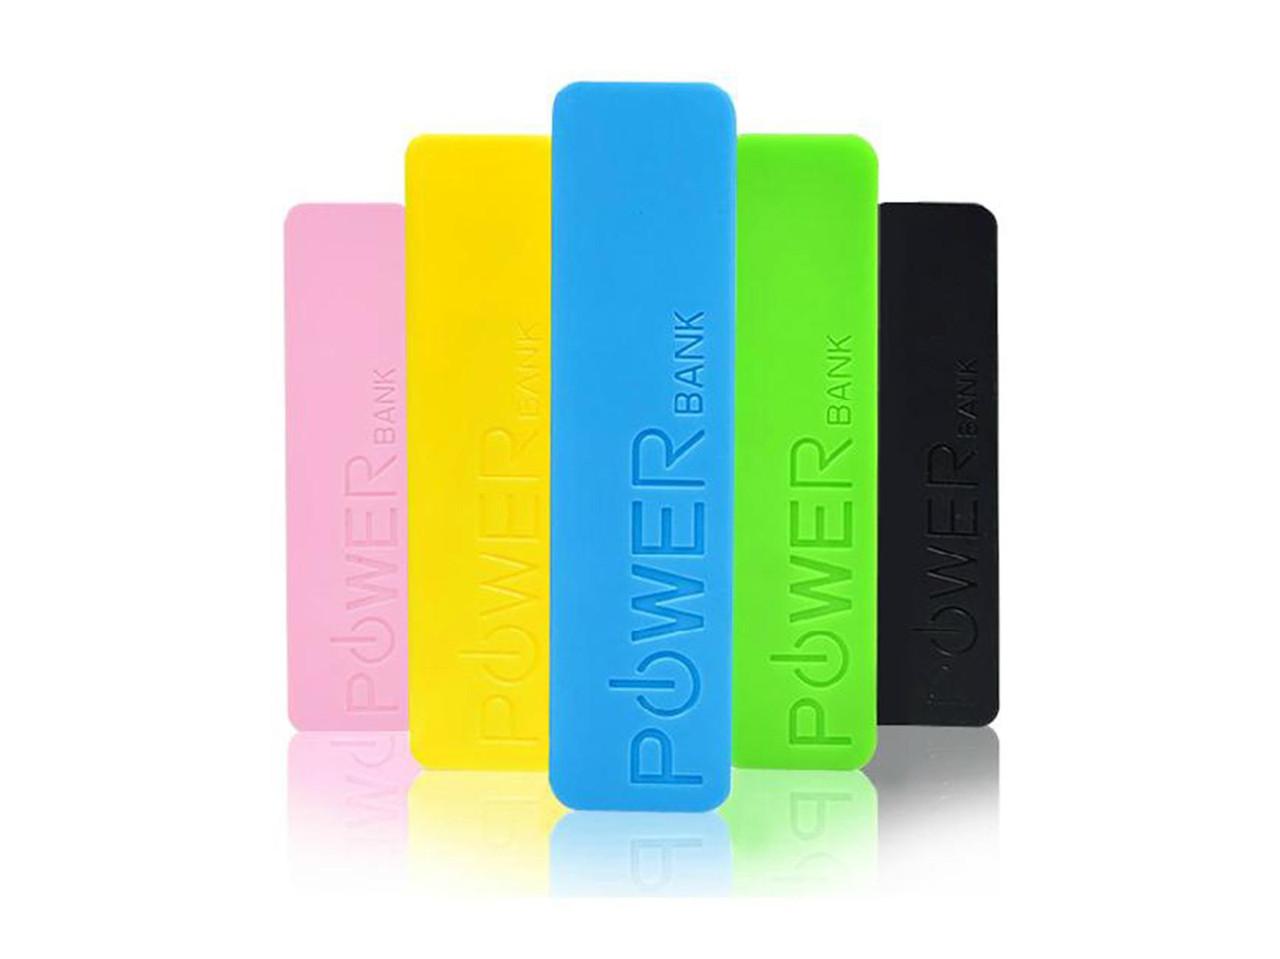 Портативна зарядка Power Bank 2600mAh